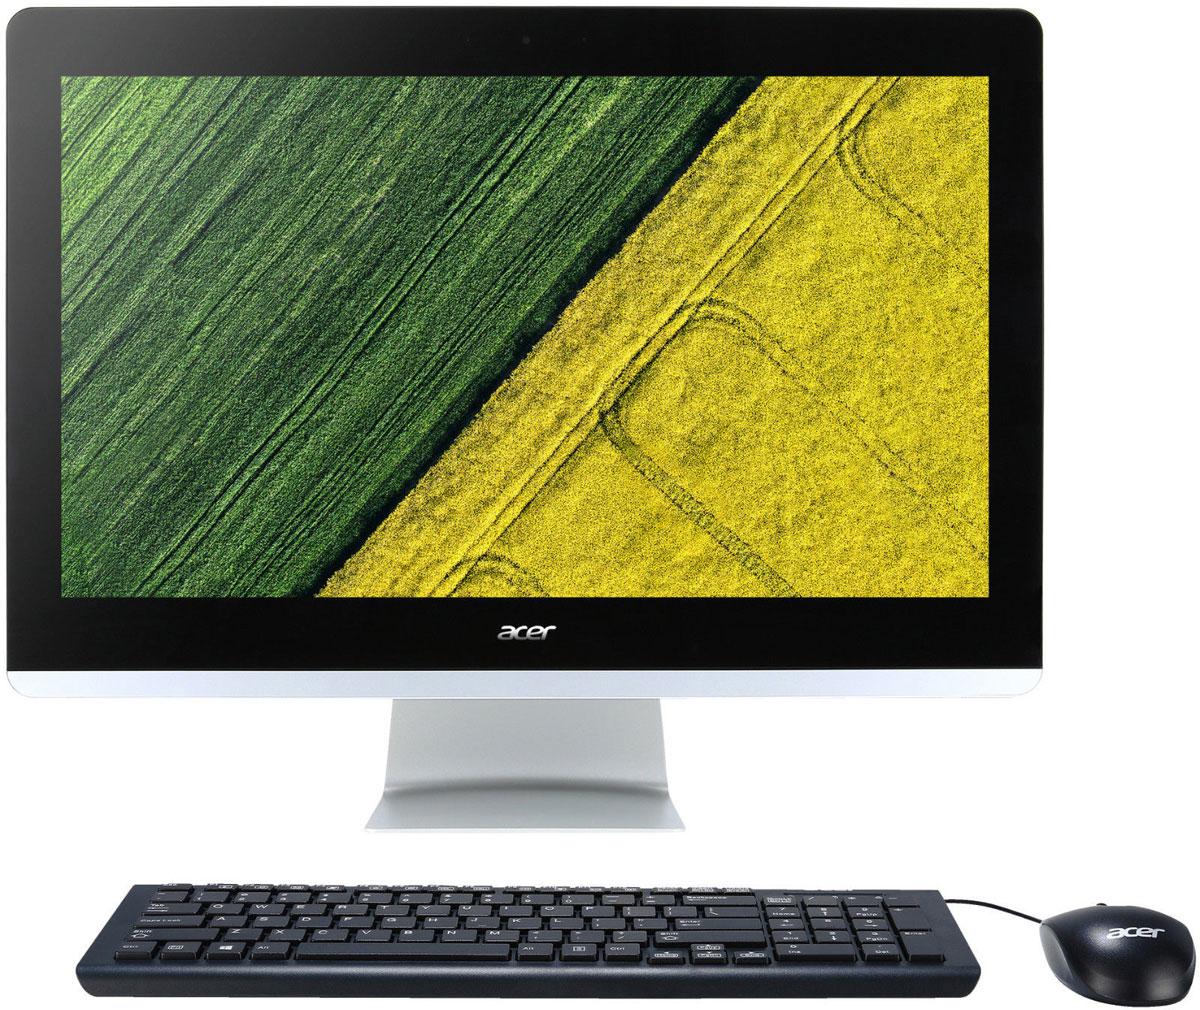 Zakazat.ru Acer Aspire Z22-780, Black моноблок (DQ.B82ER.006)